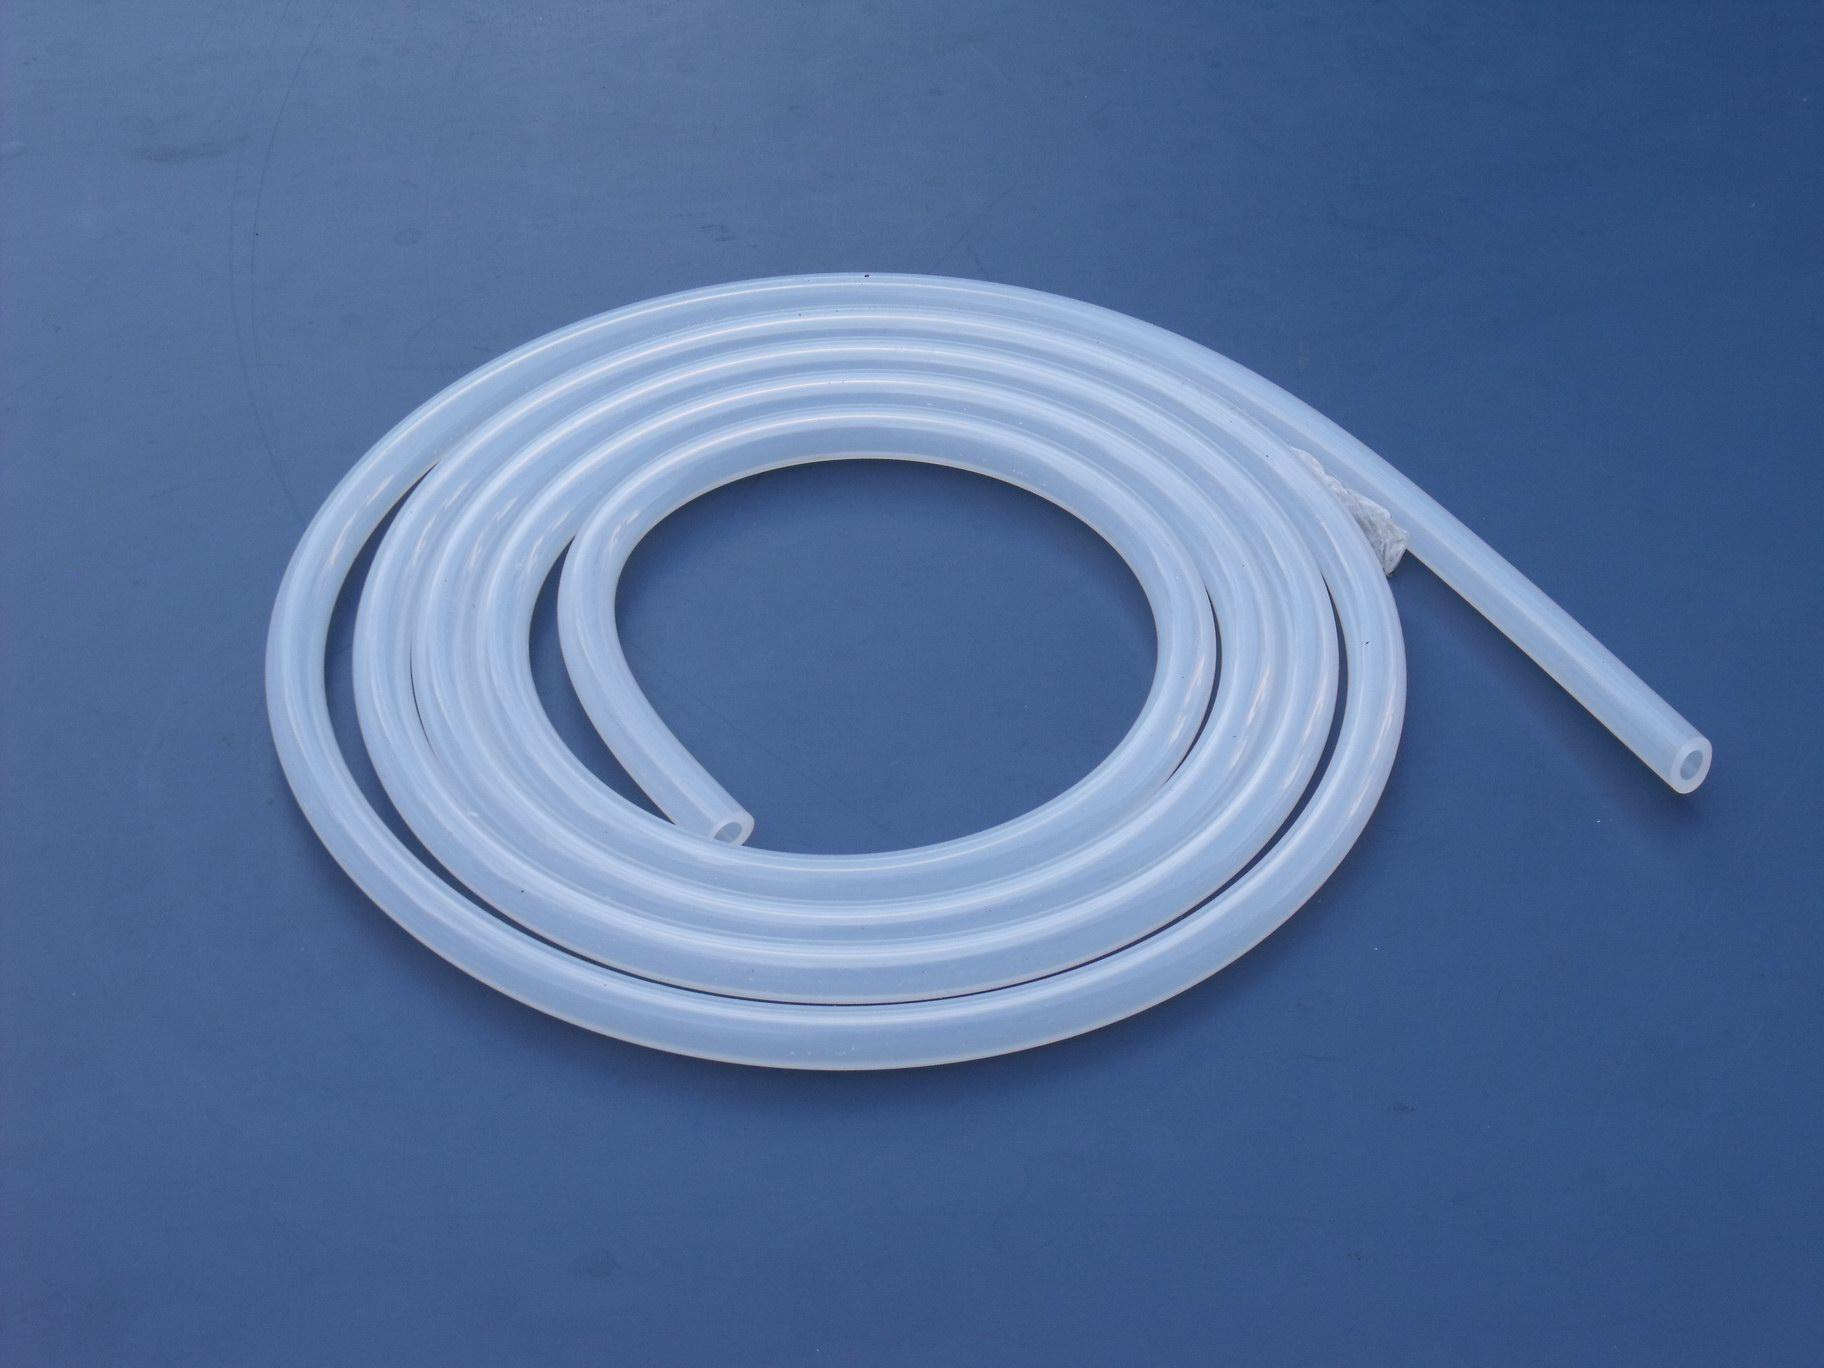 Food grade flexible tubing nissan key fob cover